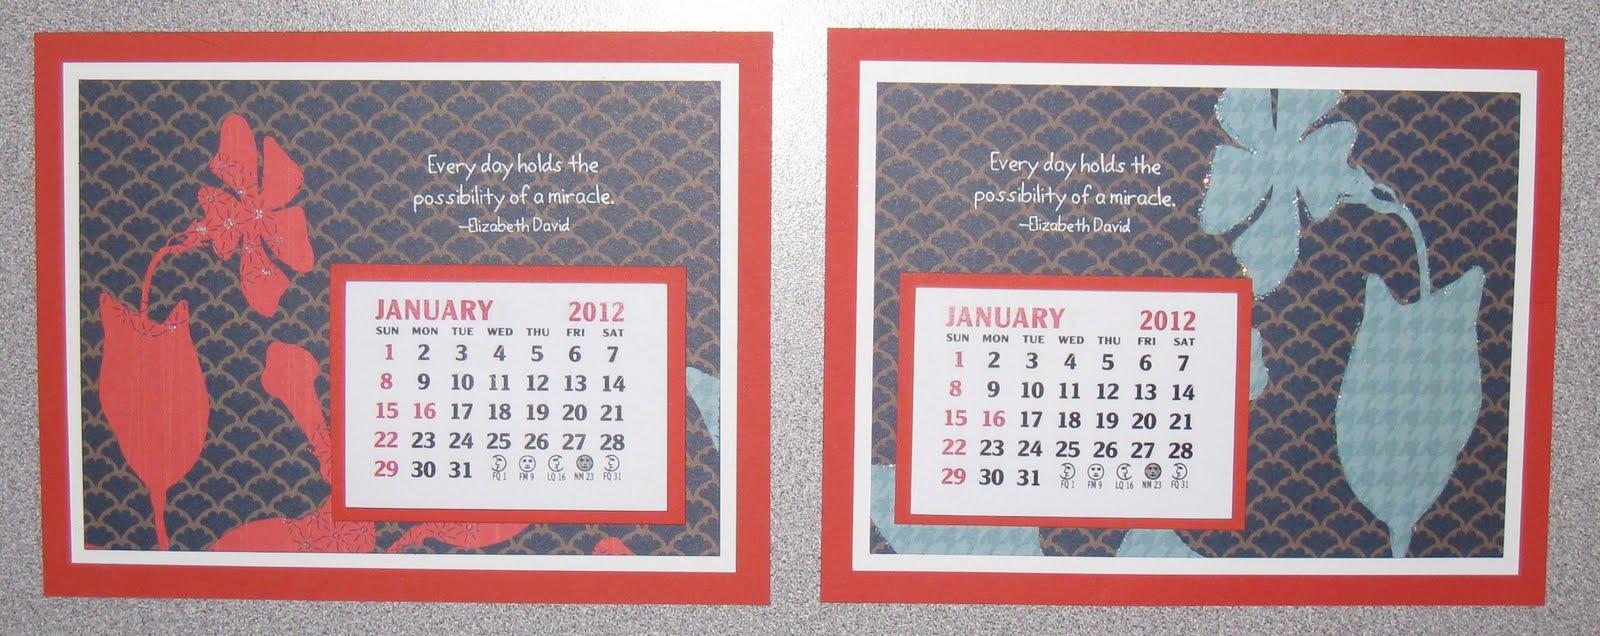 Calendar Craft Projects : Cathy s craft room calendar ideas